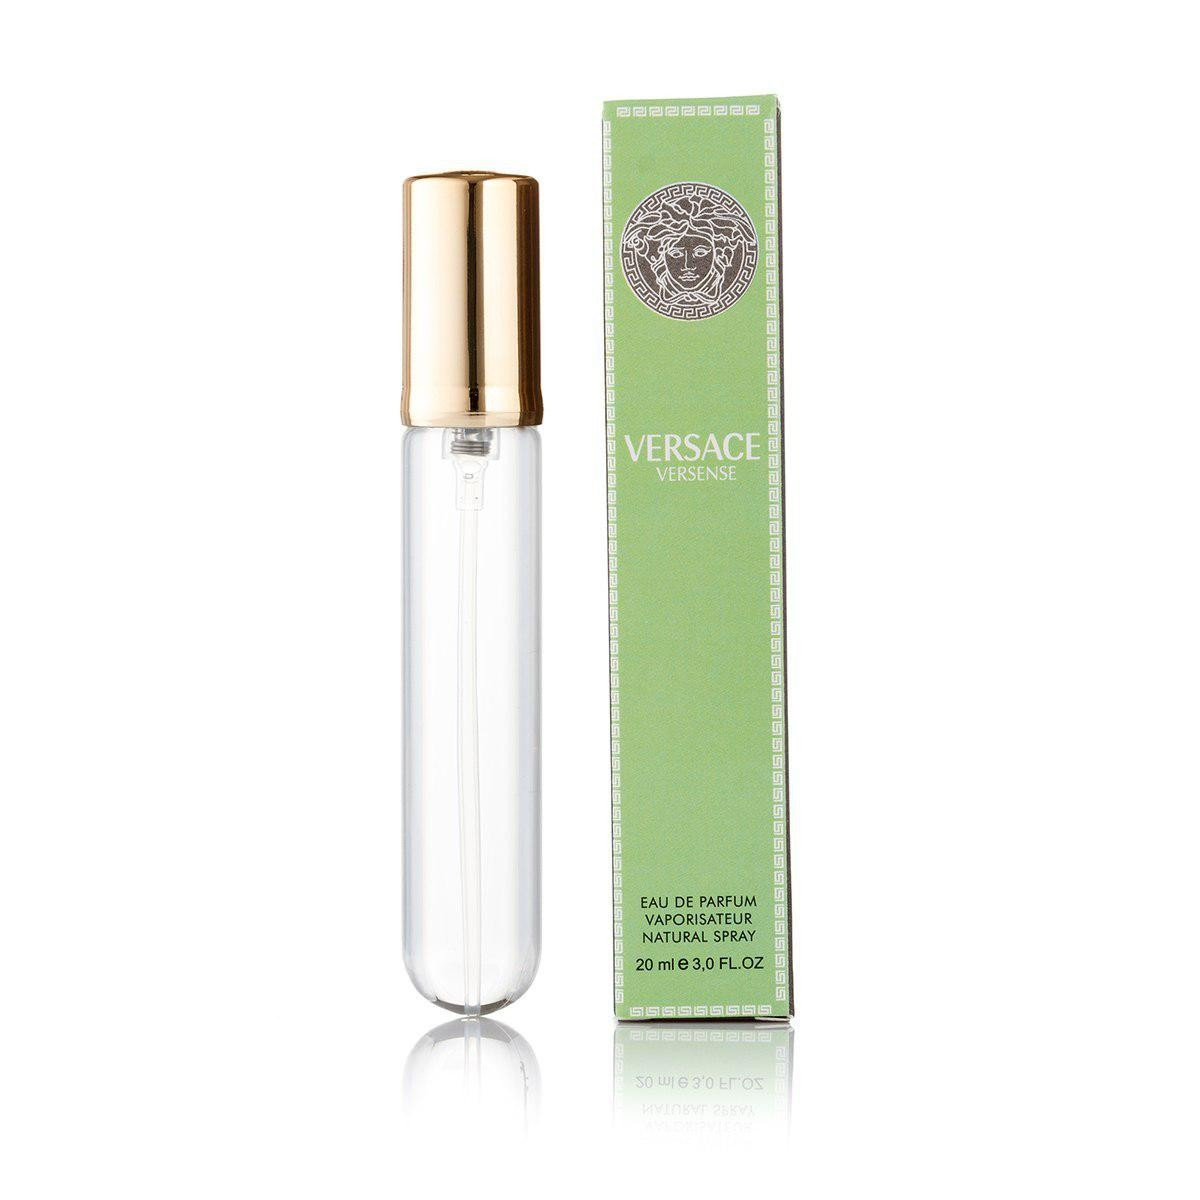 20 мл мини-парфюм Versense Versace (ж)